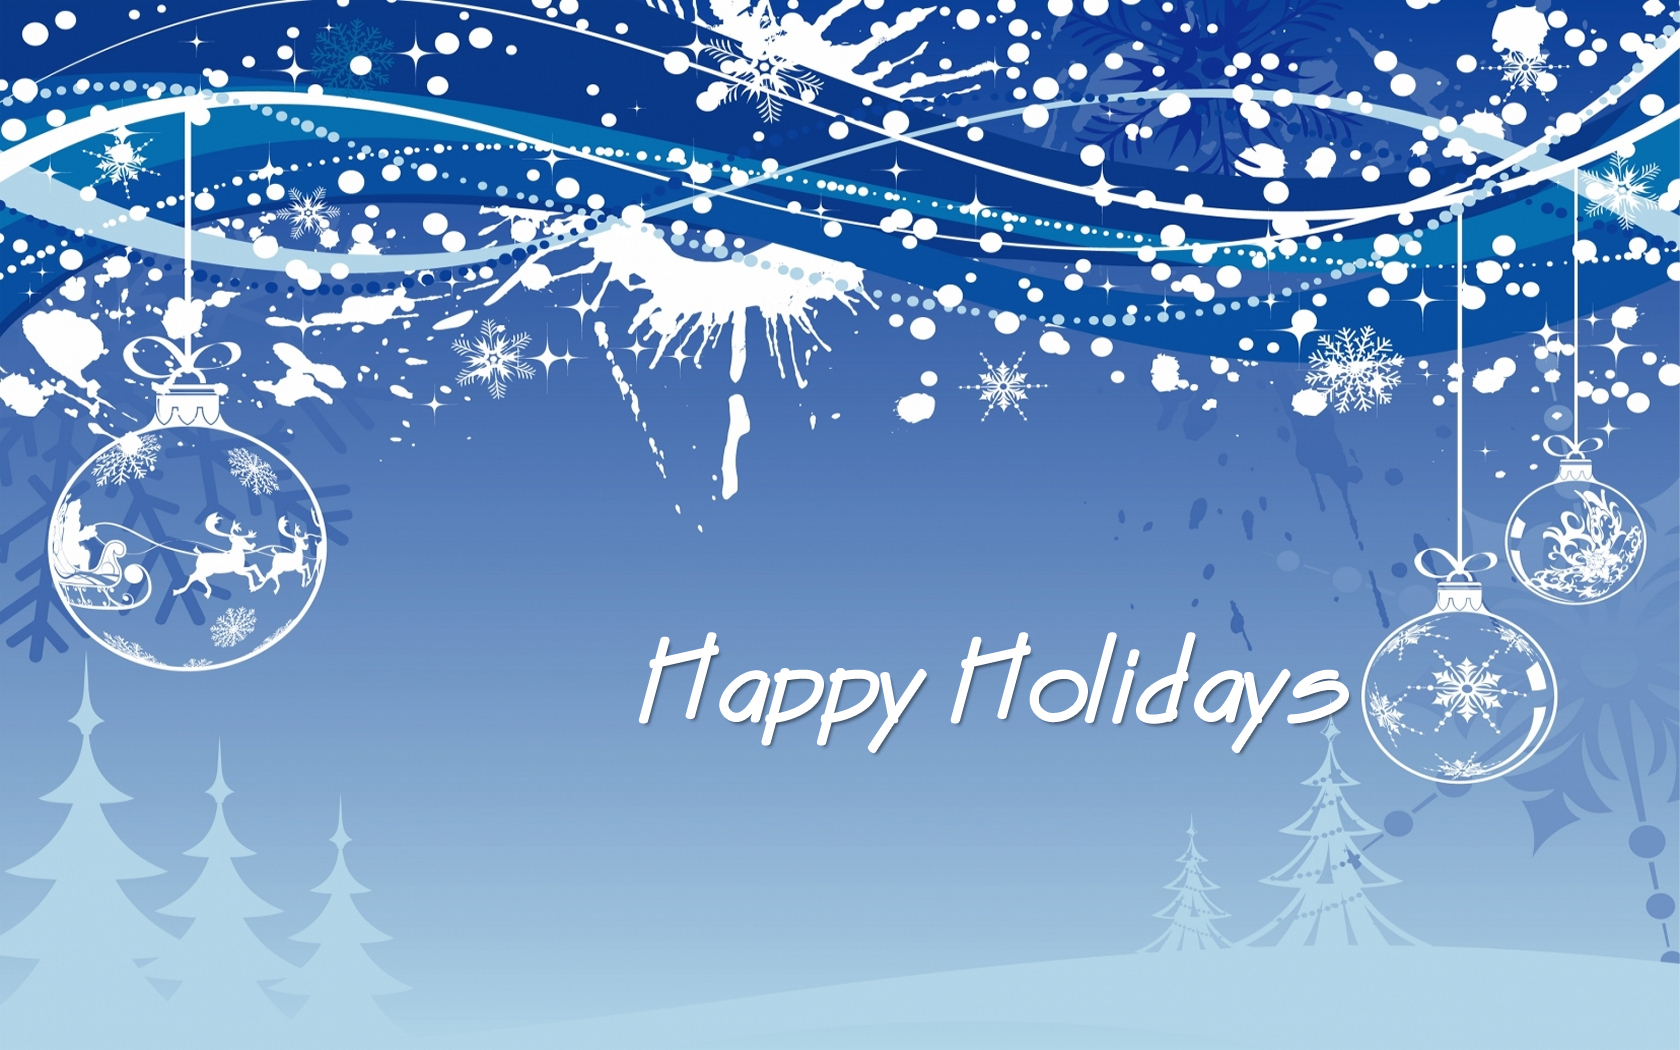 Fullsize Of Happy Holidays Message